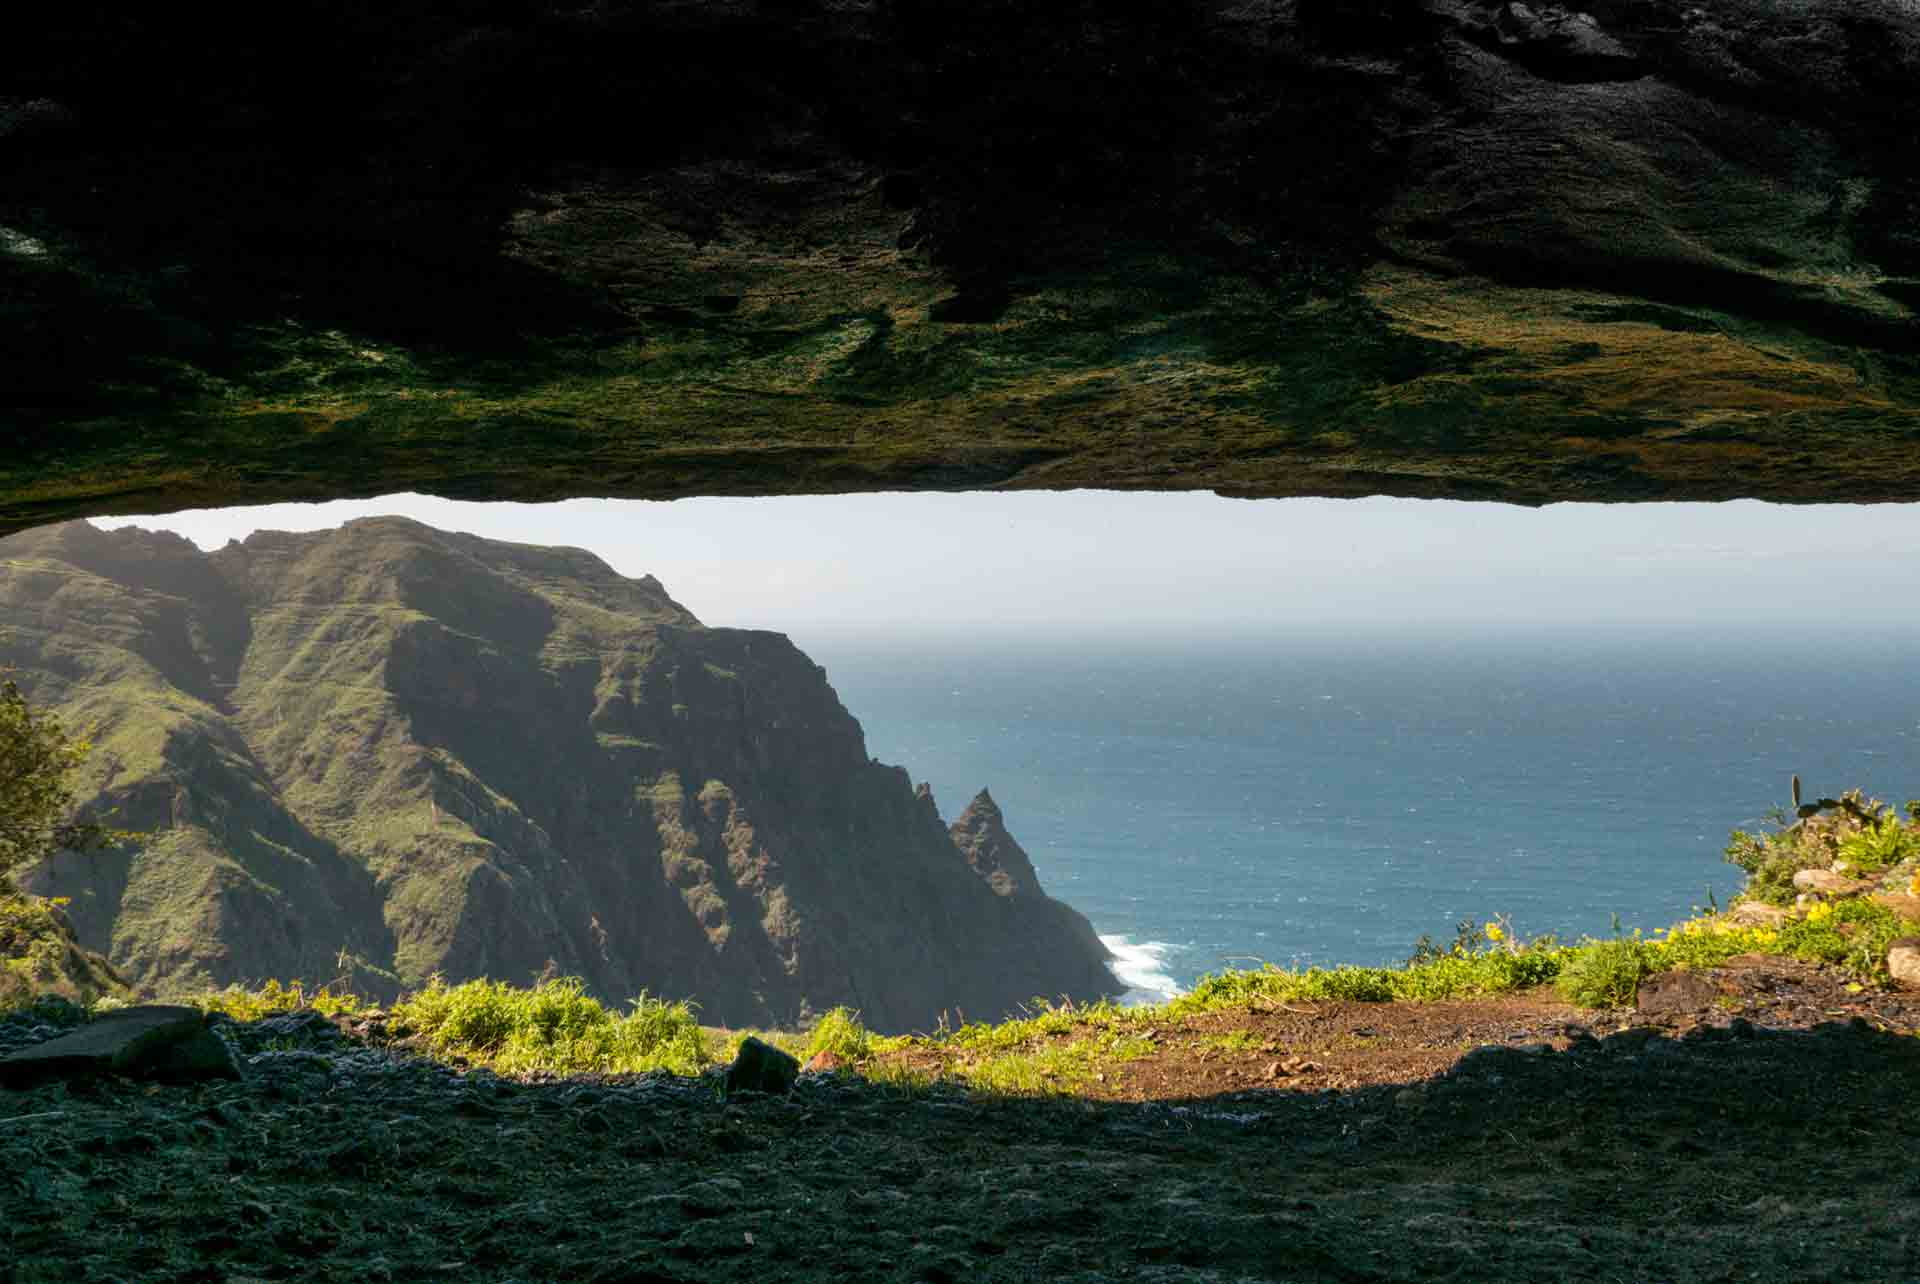 cave-hike-taborno-tenerife-park